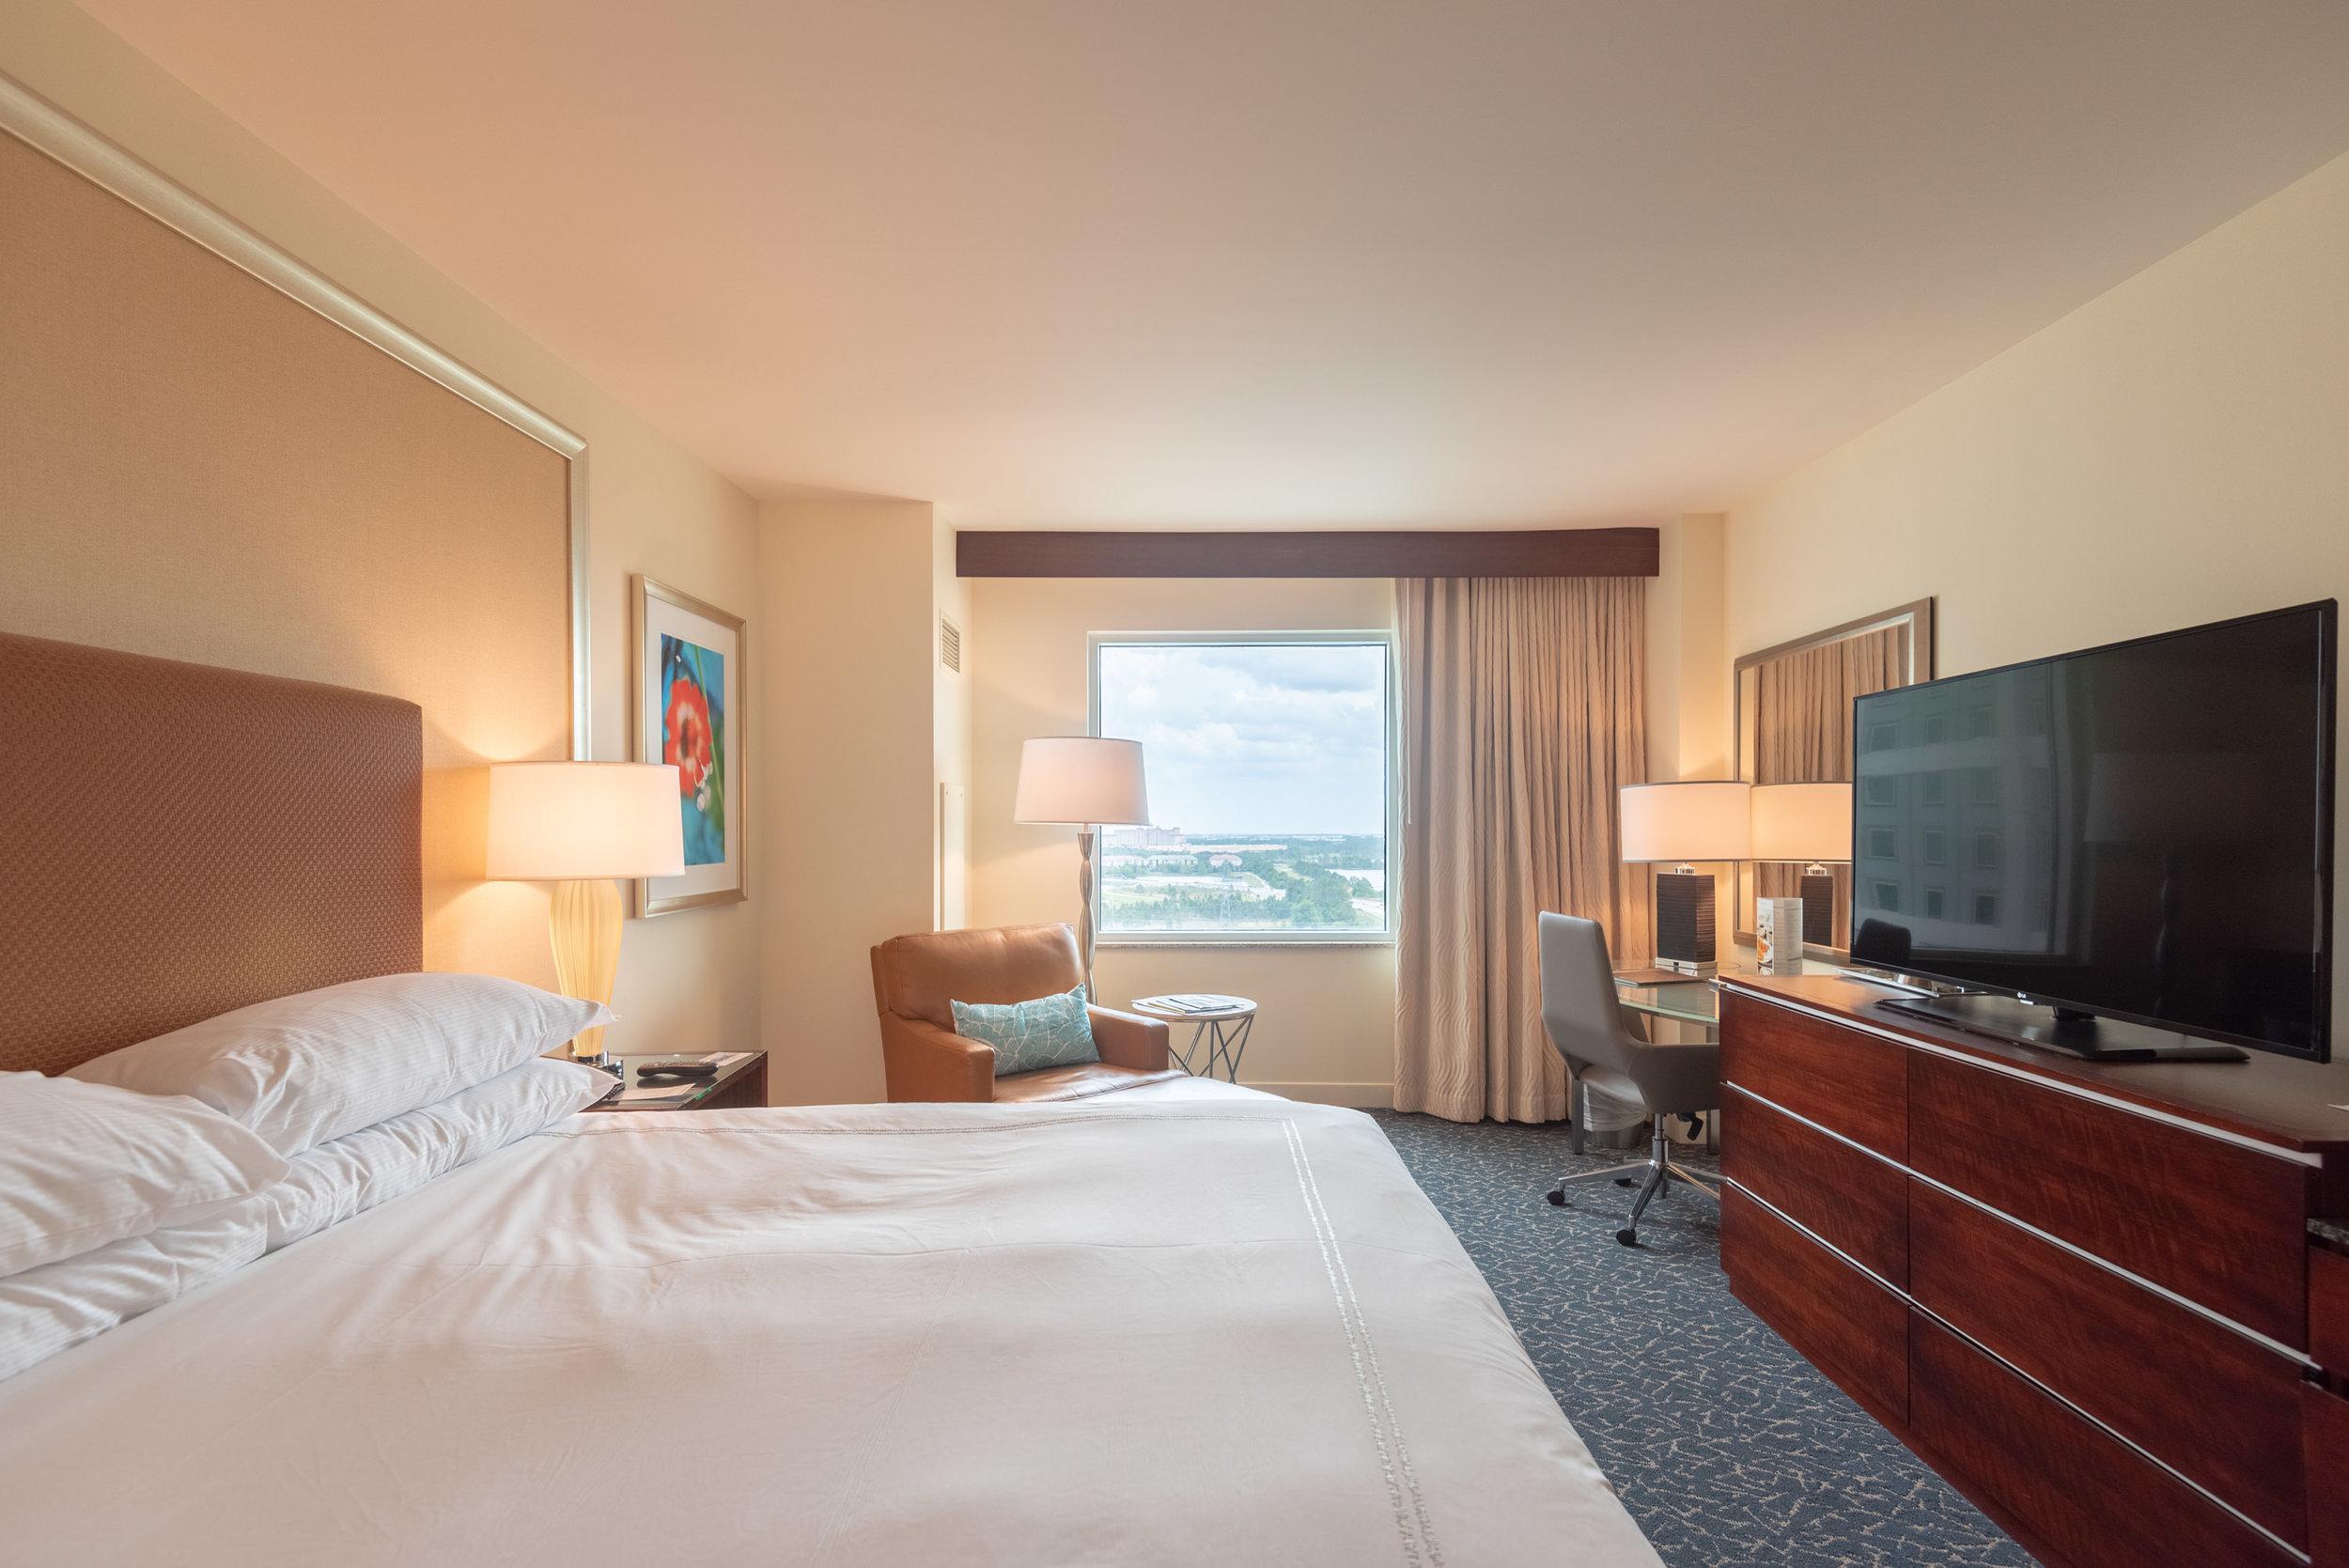 Bedroom  Pool View Room - Hilton Orlando